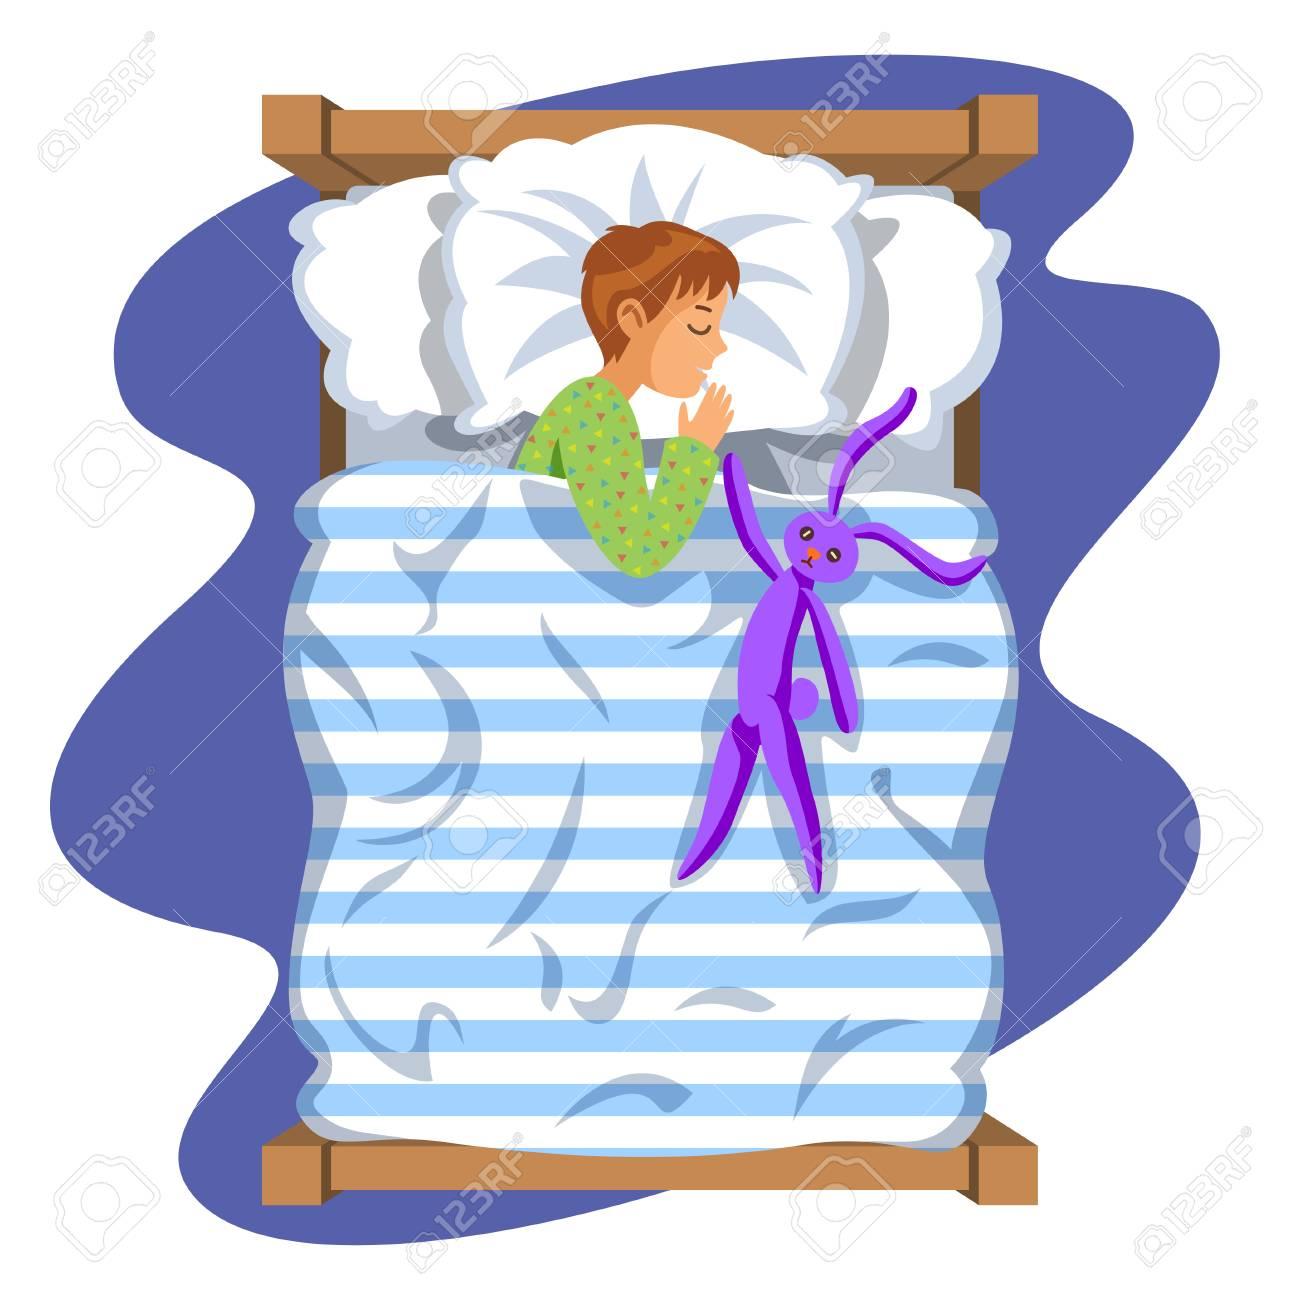 Boy Sleep Bedtime In His Bedroom Bed With Toy Bunny. Cartoon ...